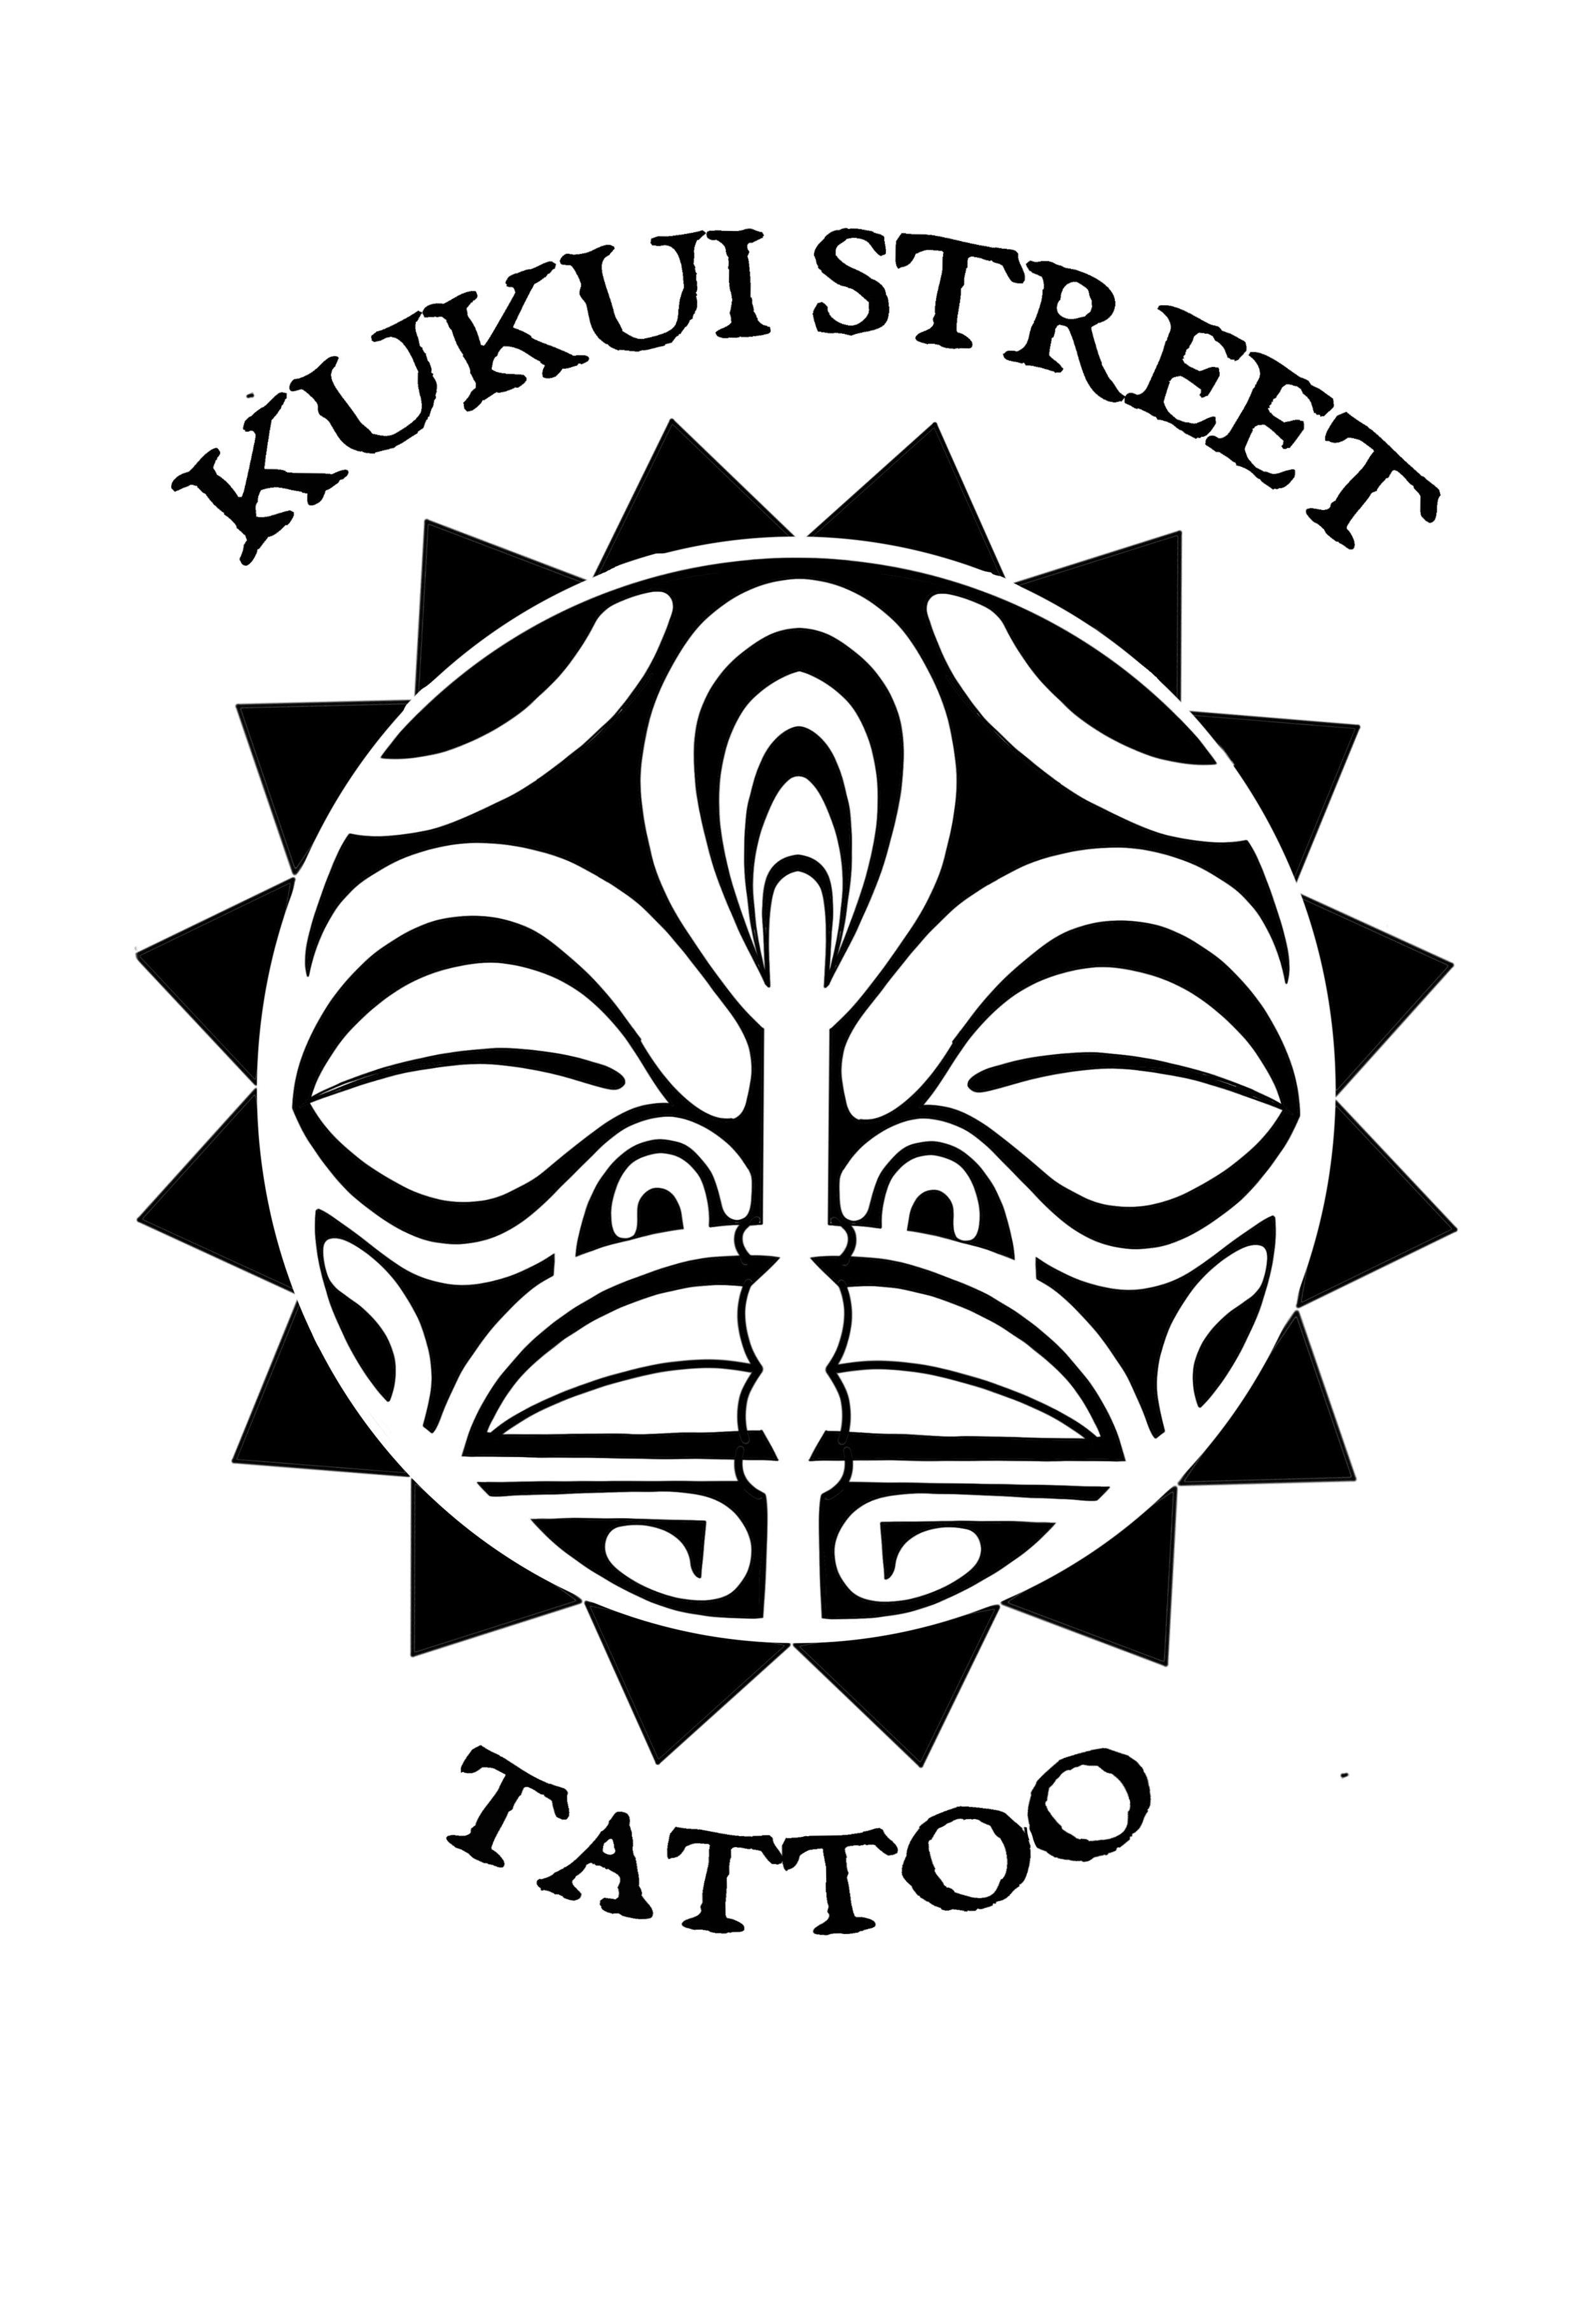 Located in Kapaa near the skate park:  4569 Kukui St #101B, Kapaa, HI 96746   (808) 212-1383